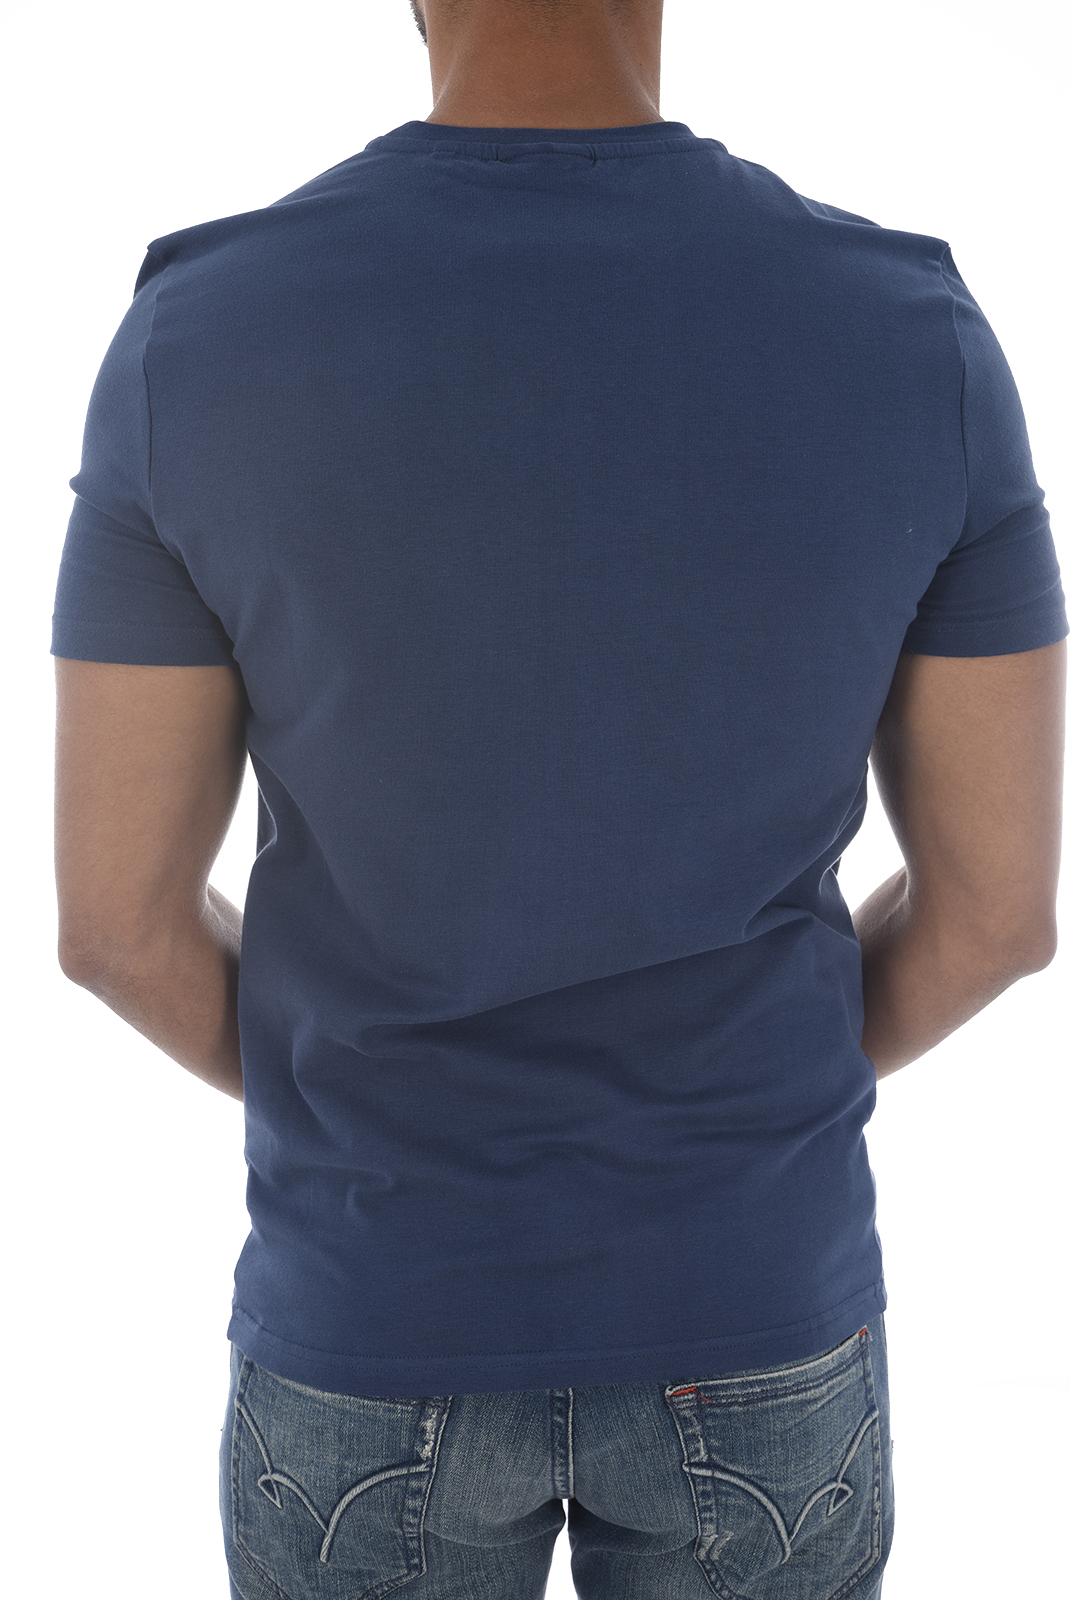 Tee-shirts  Kaporal SALUT H18M11 BLUE US